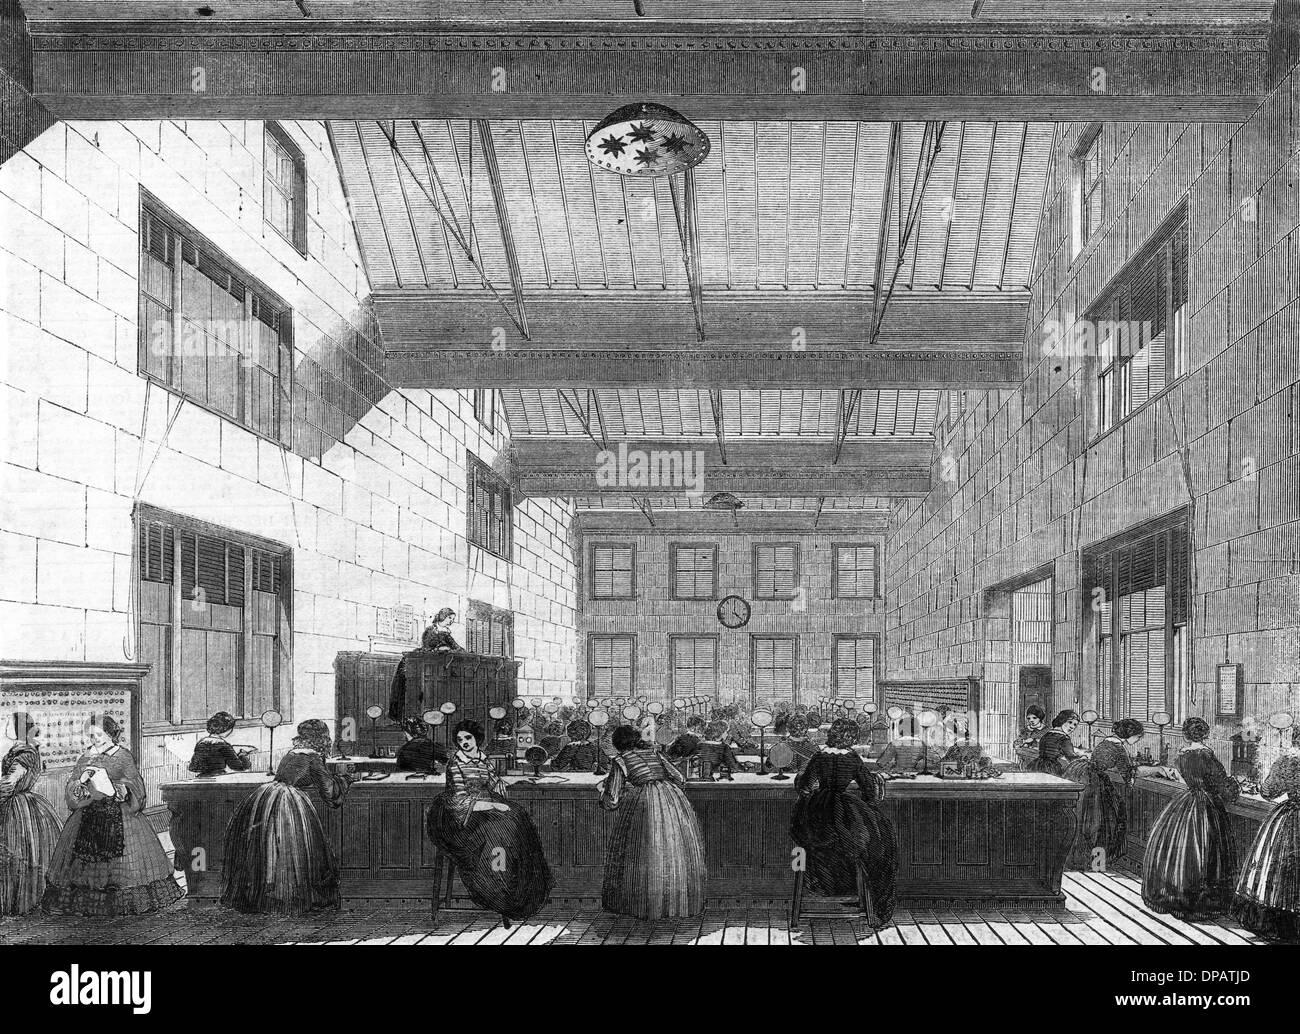 TELEGRAPH OFFICE 1859 - Stock Image